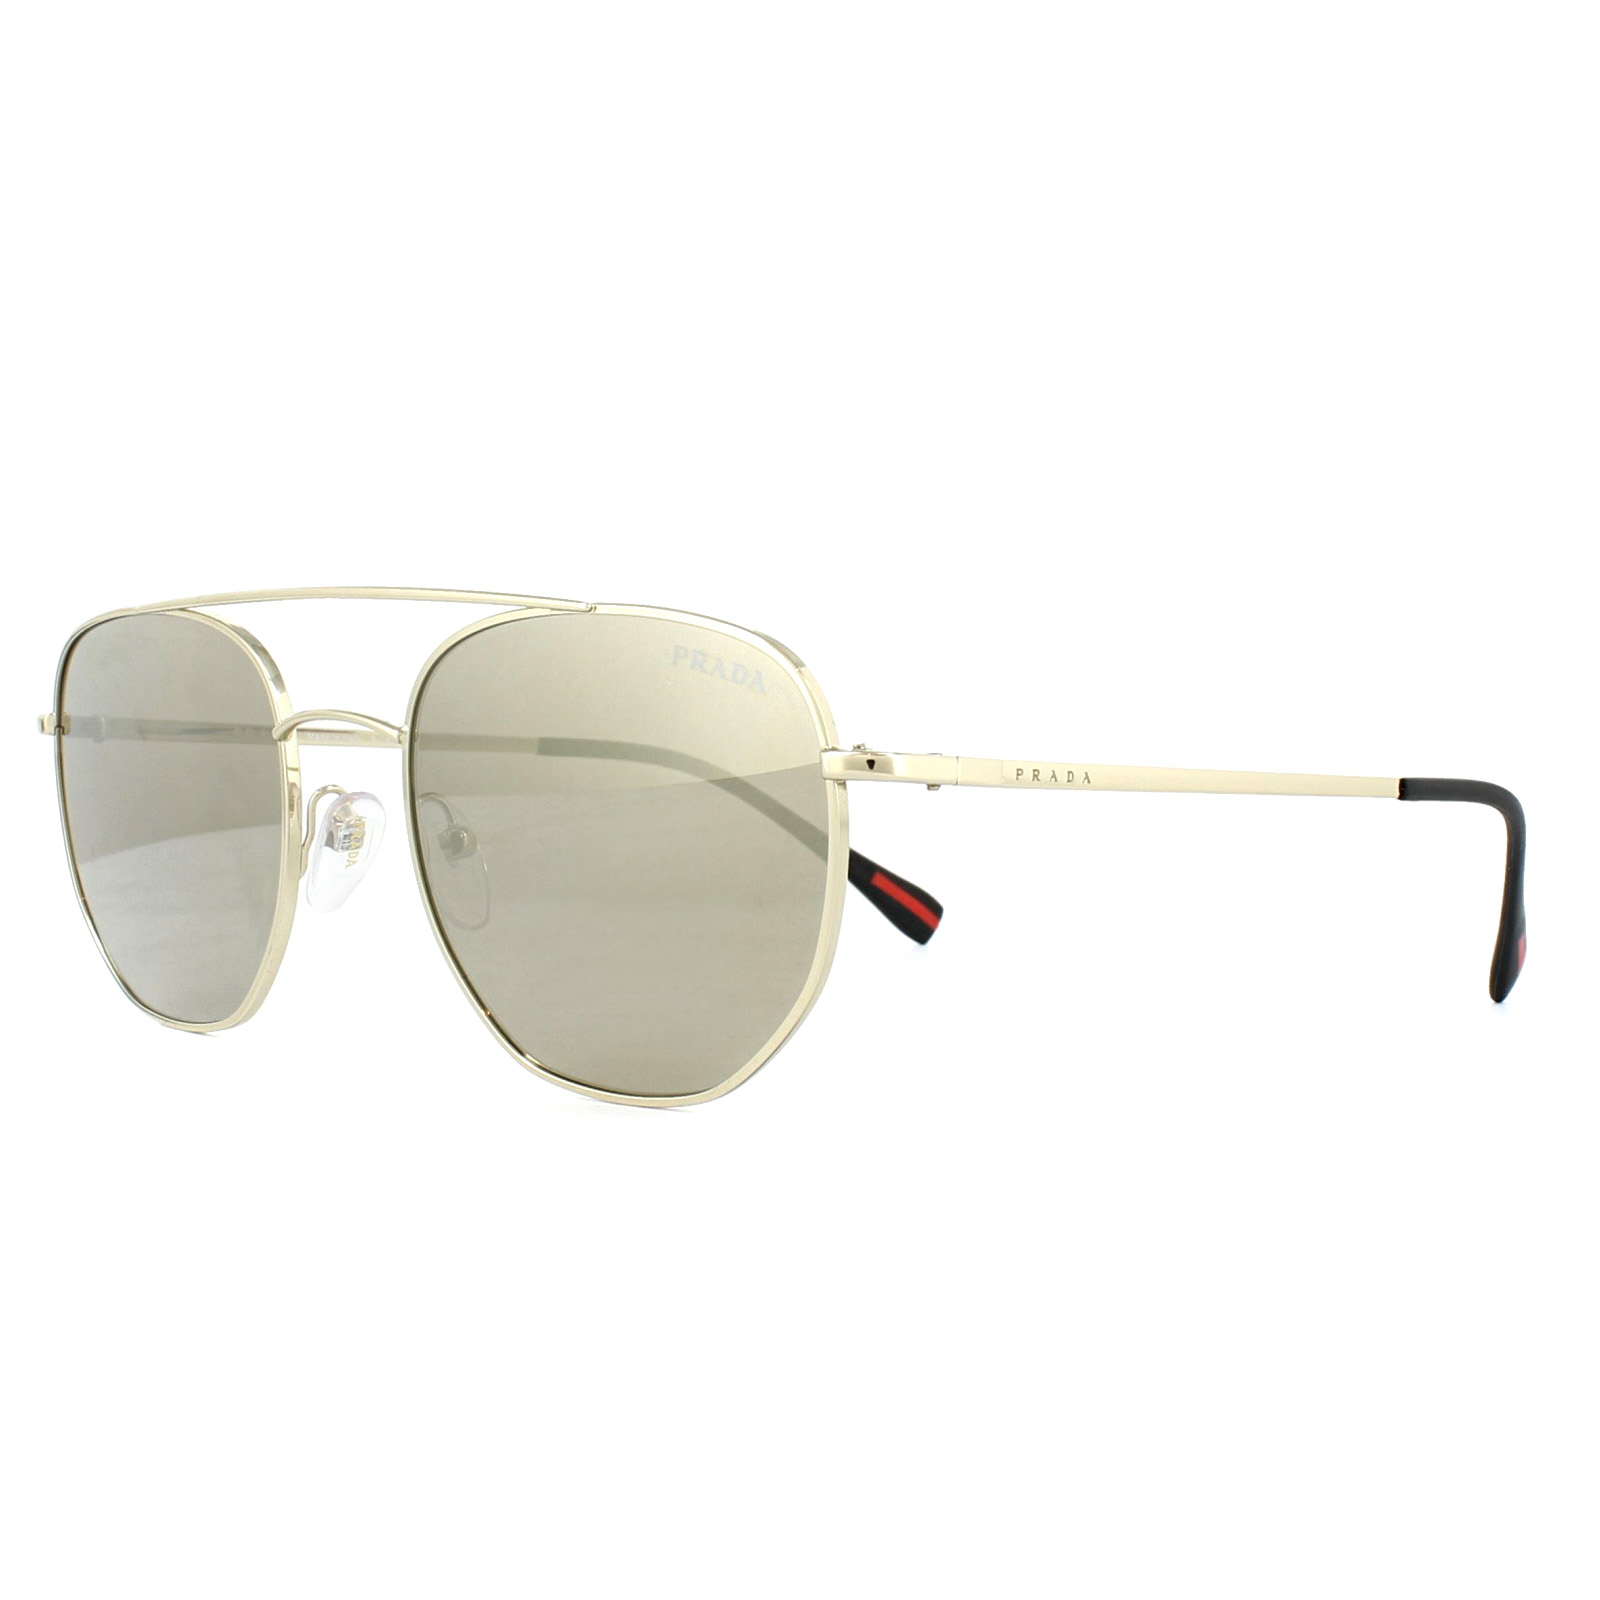 ca94830c84e8 Sentinel Prada Sport Sunglasses PS56SS ZVN1C0 Pale Gold Light Brown Mirror  Gold